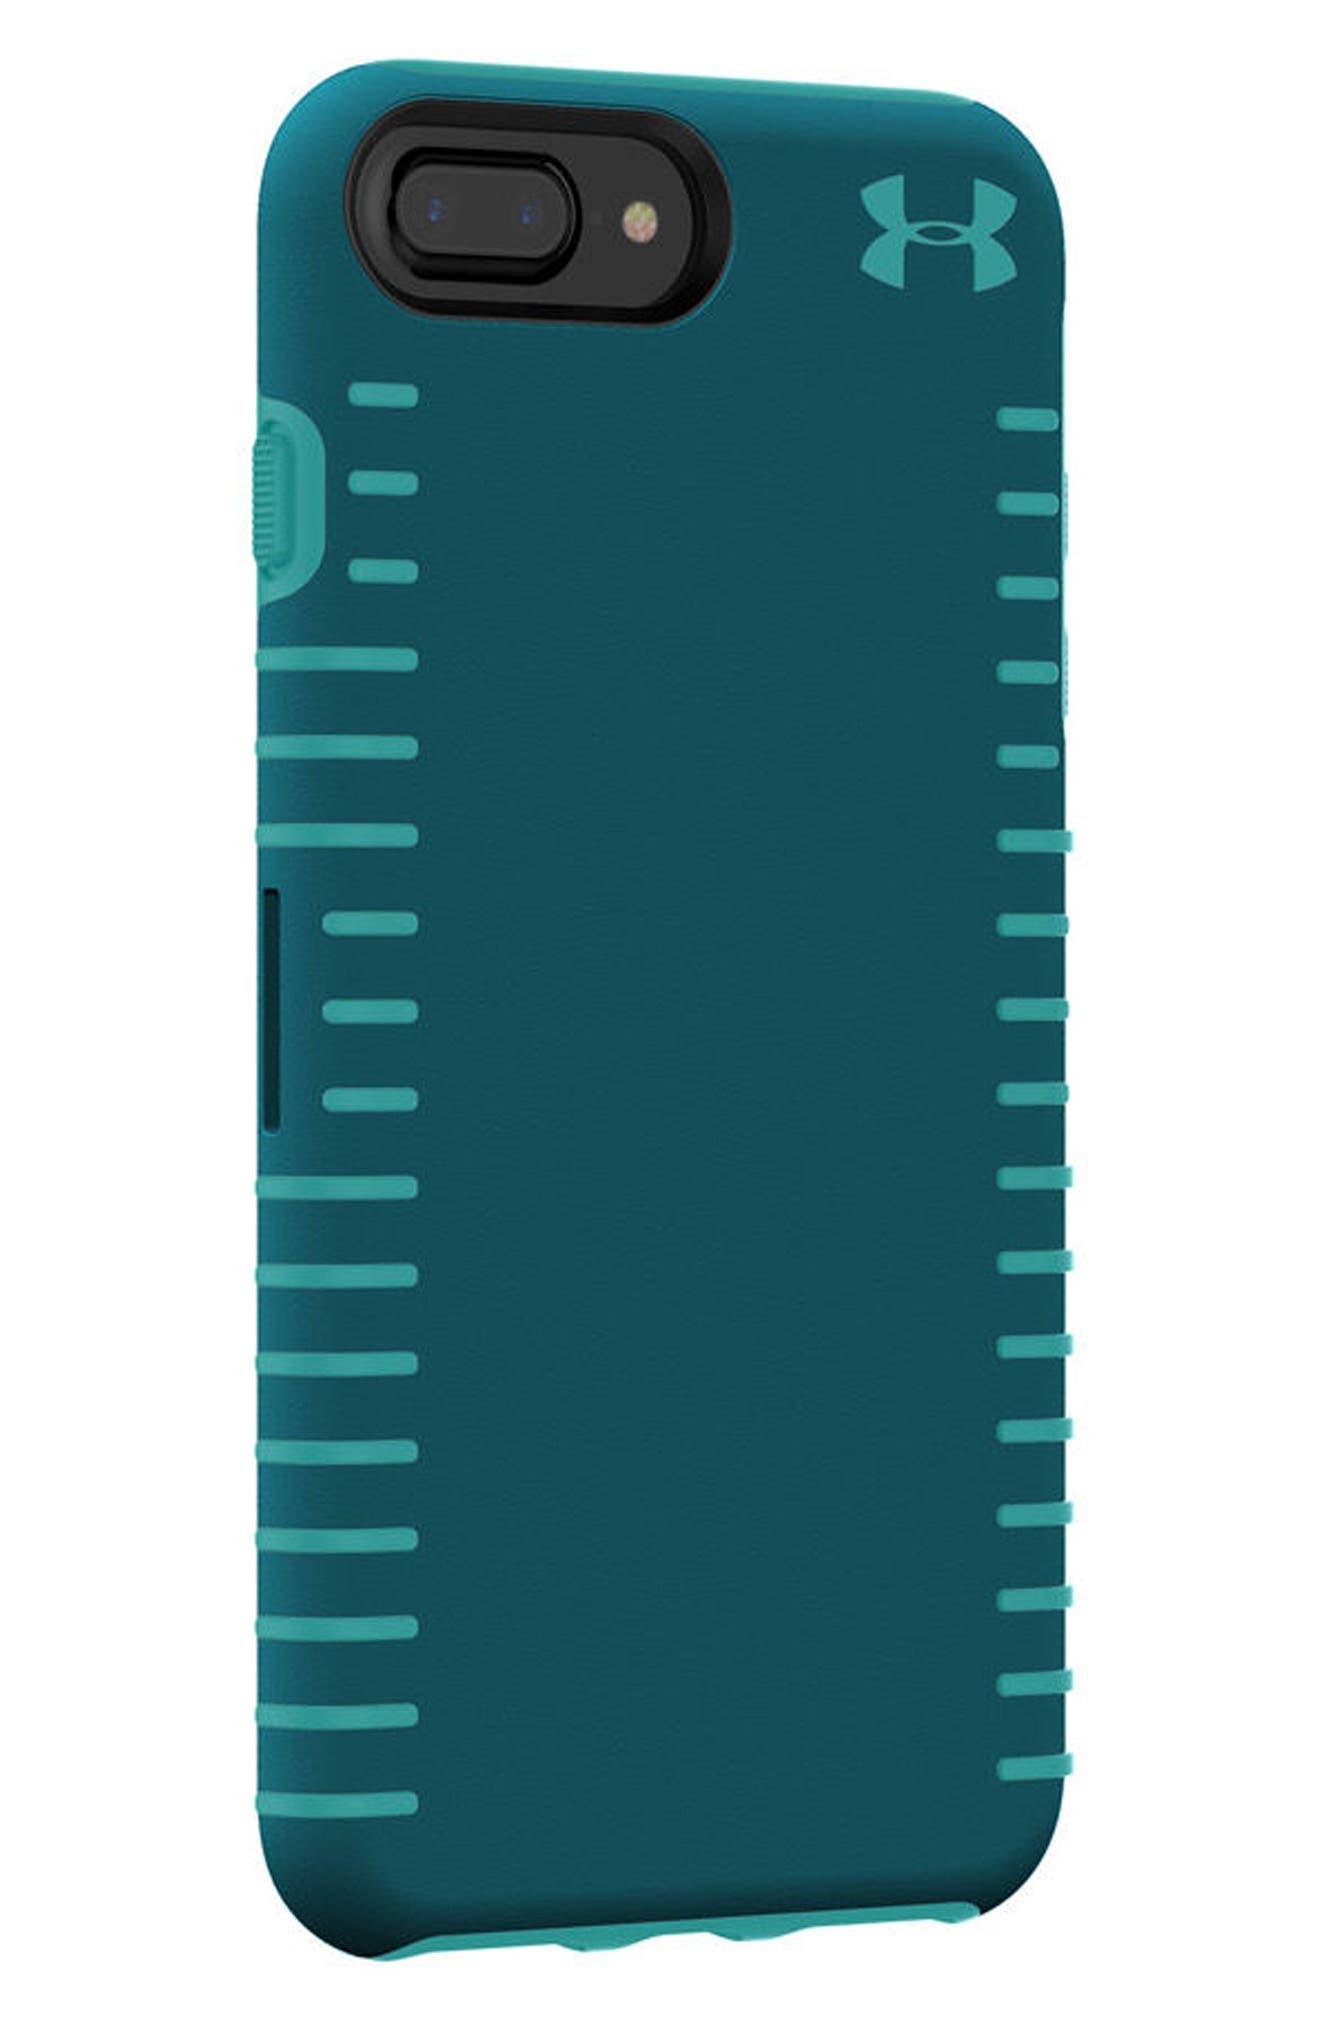 Protect Grip iPhone 6/6s/7/8 Plus Case,                             Alternate thumbnail 3, color,                             Desert Sky